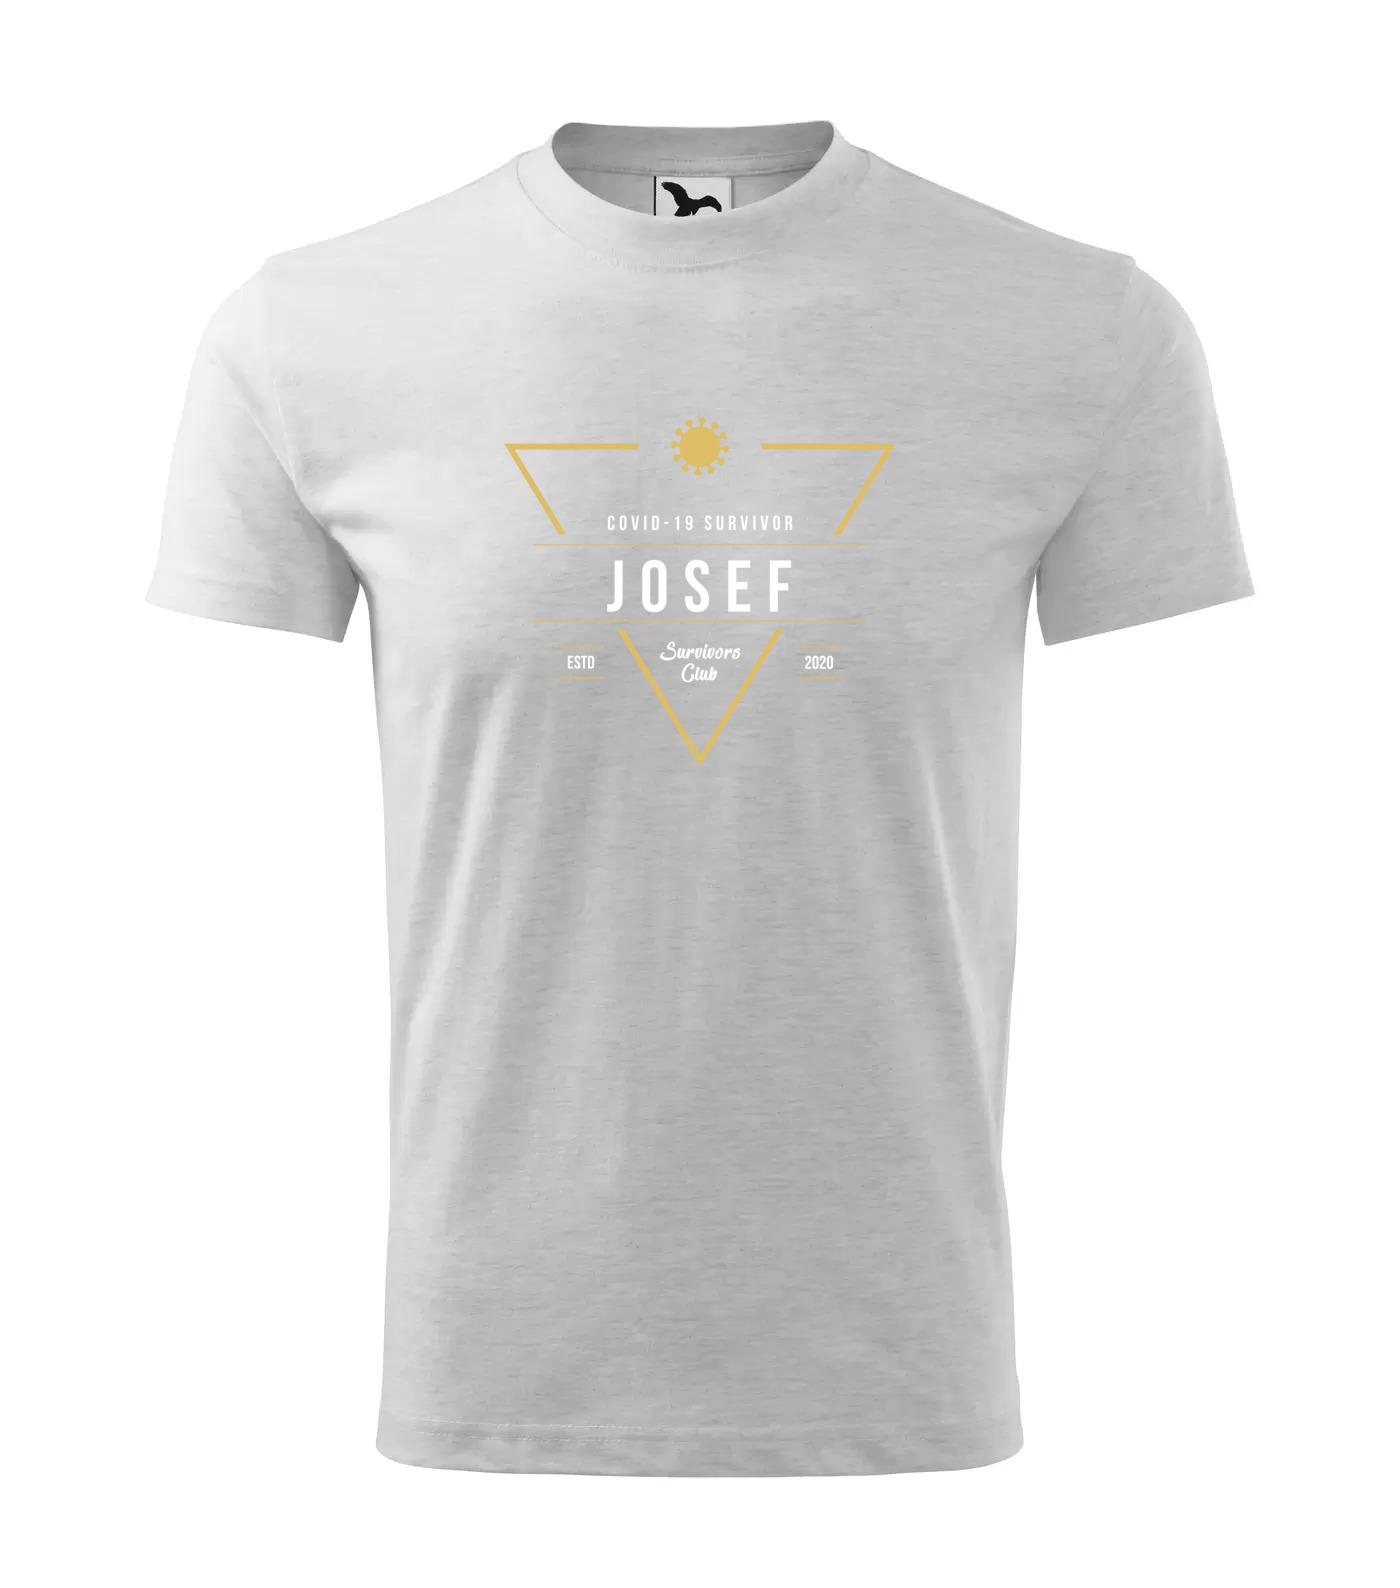 Tričko Survivor Club Josef